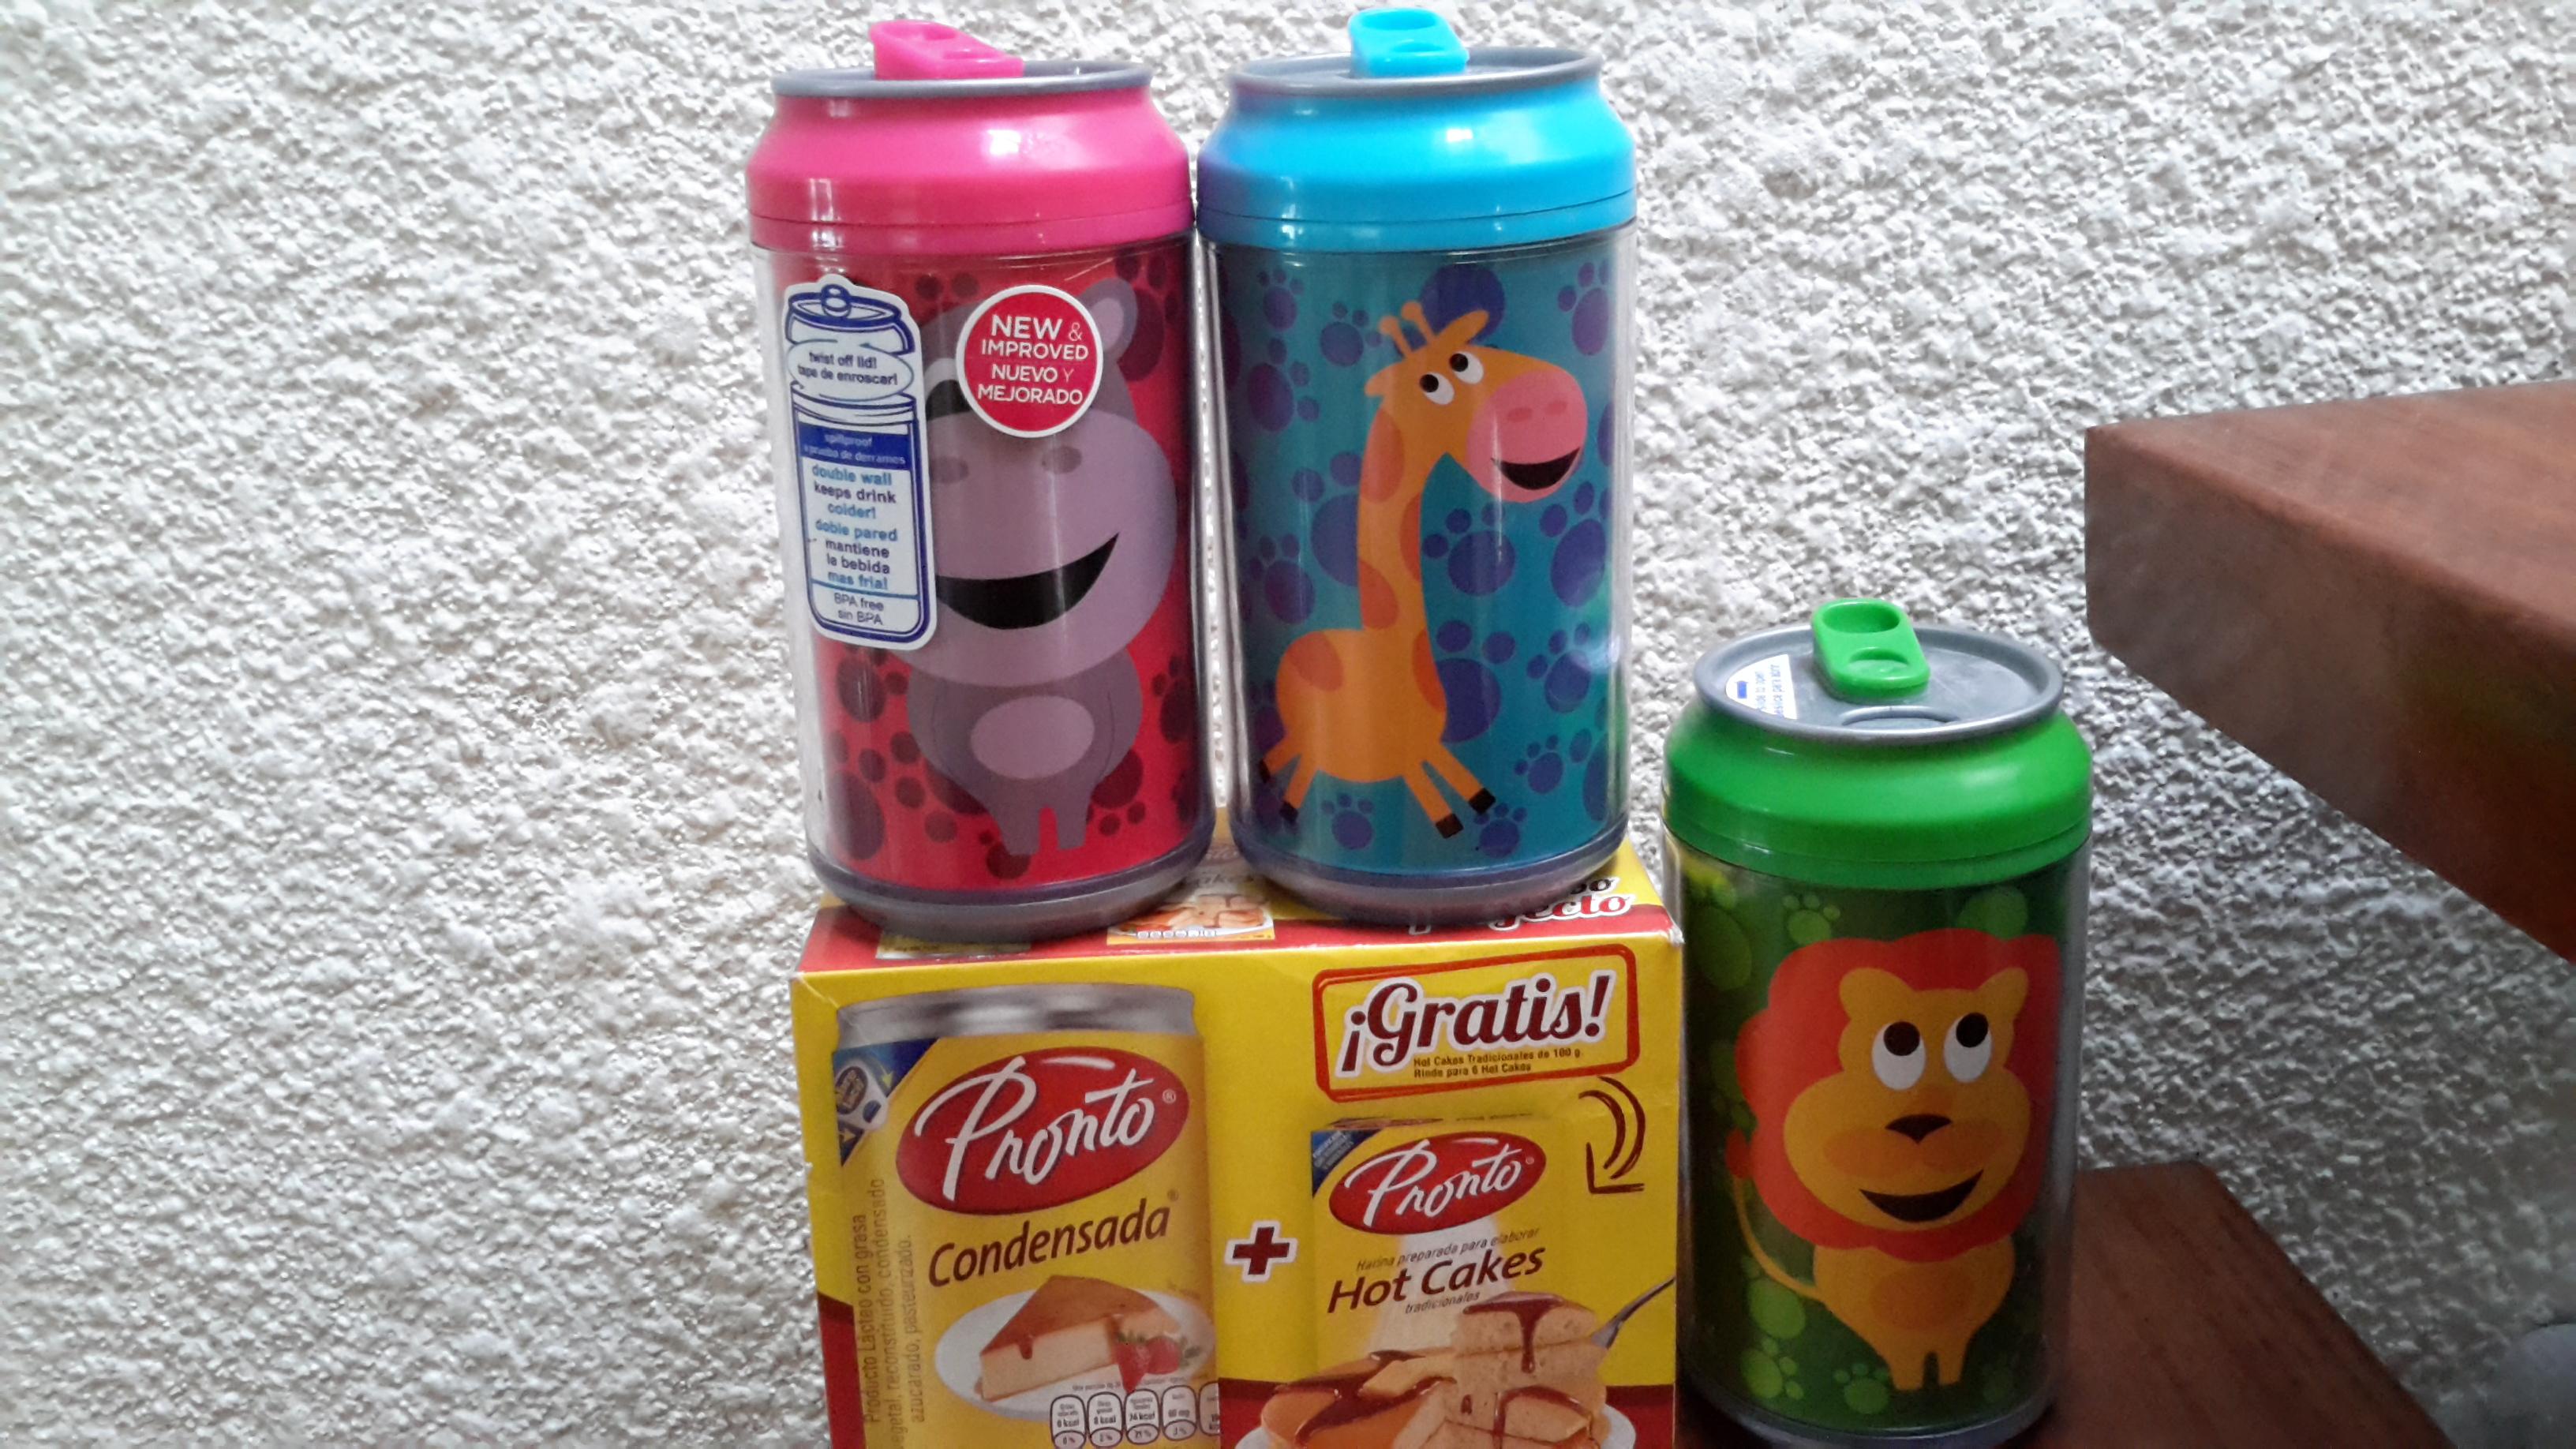 Walmart Nichupte Cancún: Latas Kids Cool Gear a $16.01 y Paquete Pronto a $6.02